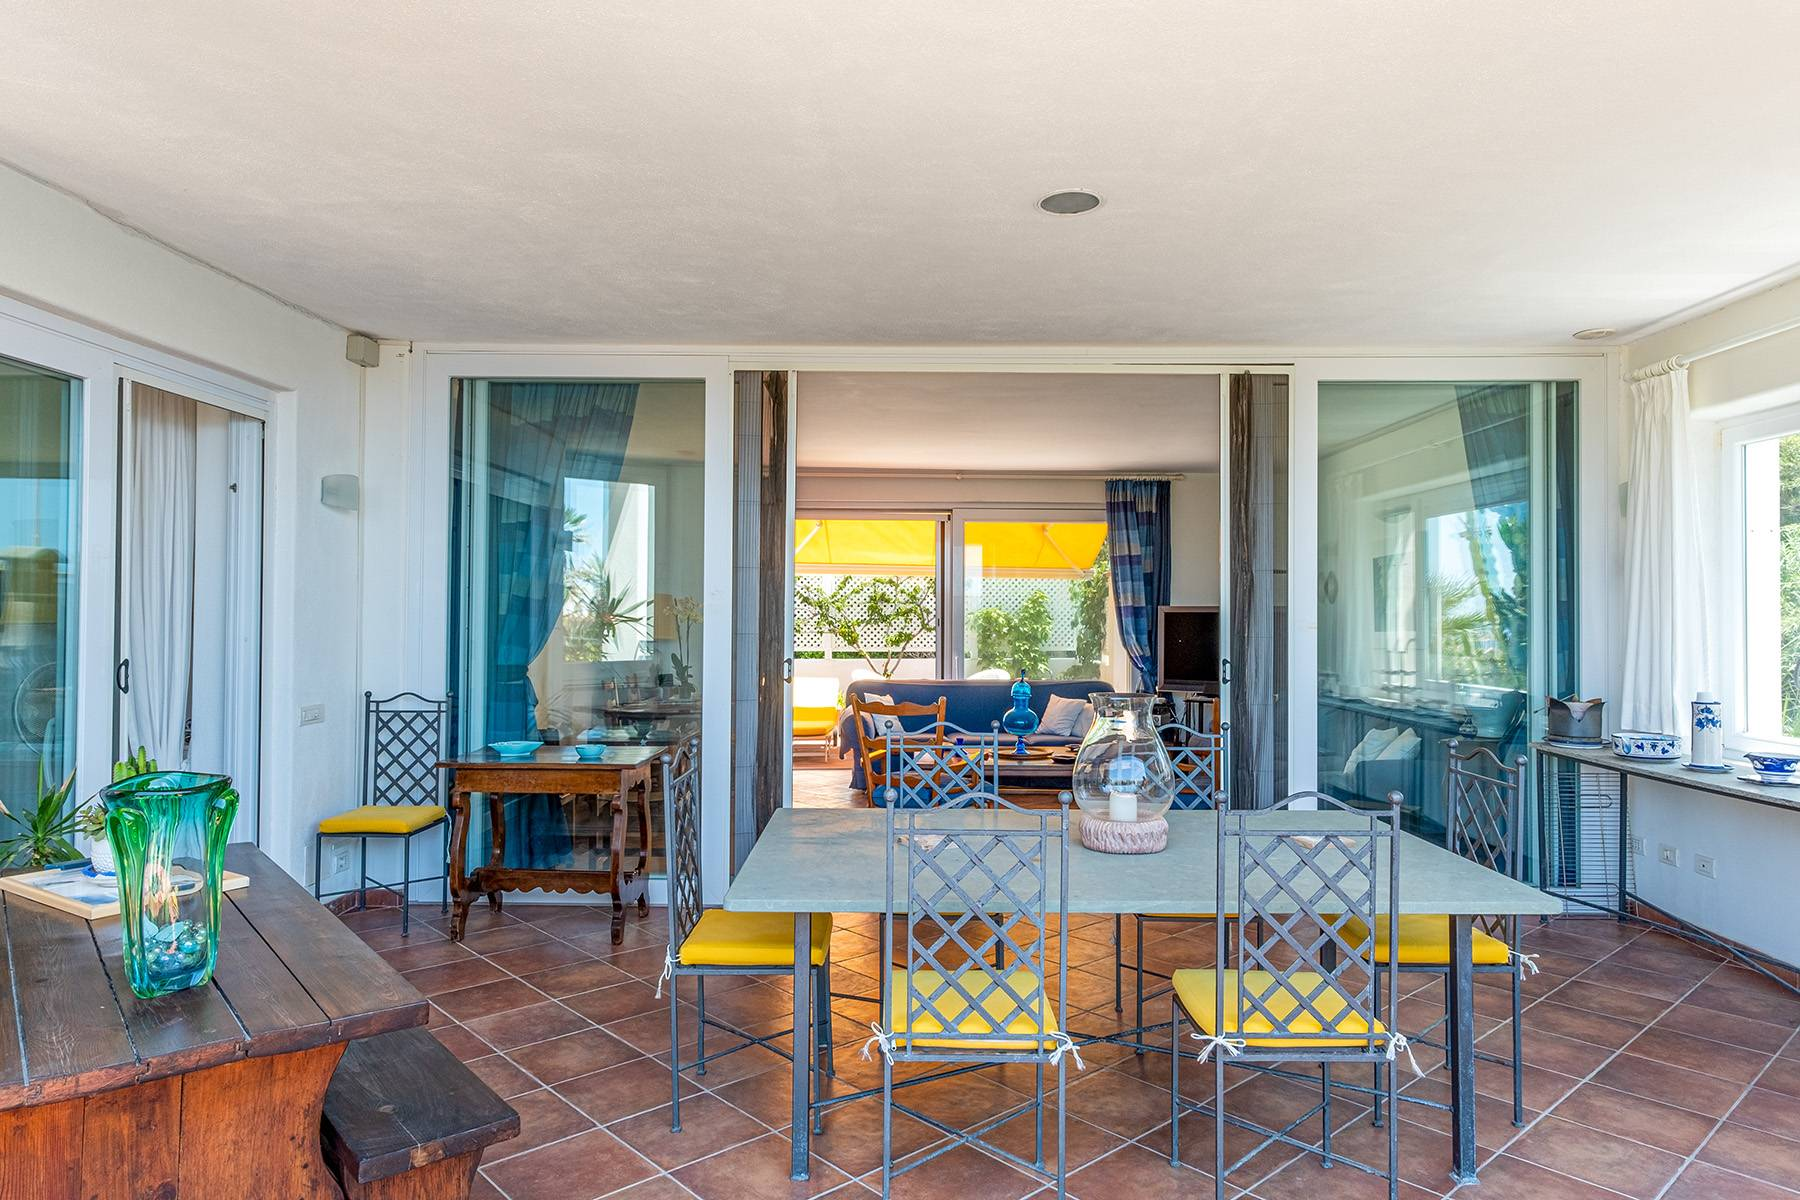 Villa in Vendita a Ischia: 5 locali, 400 mq - Foto 7